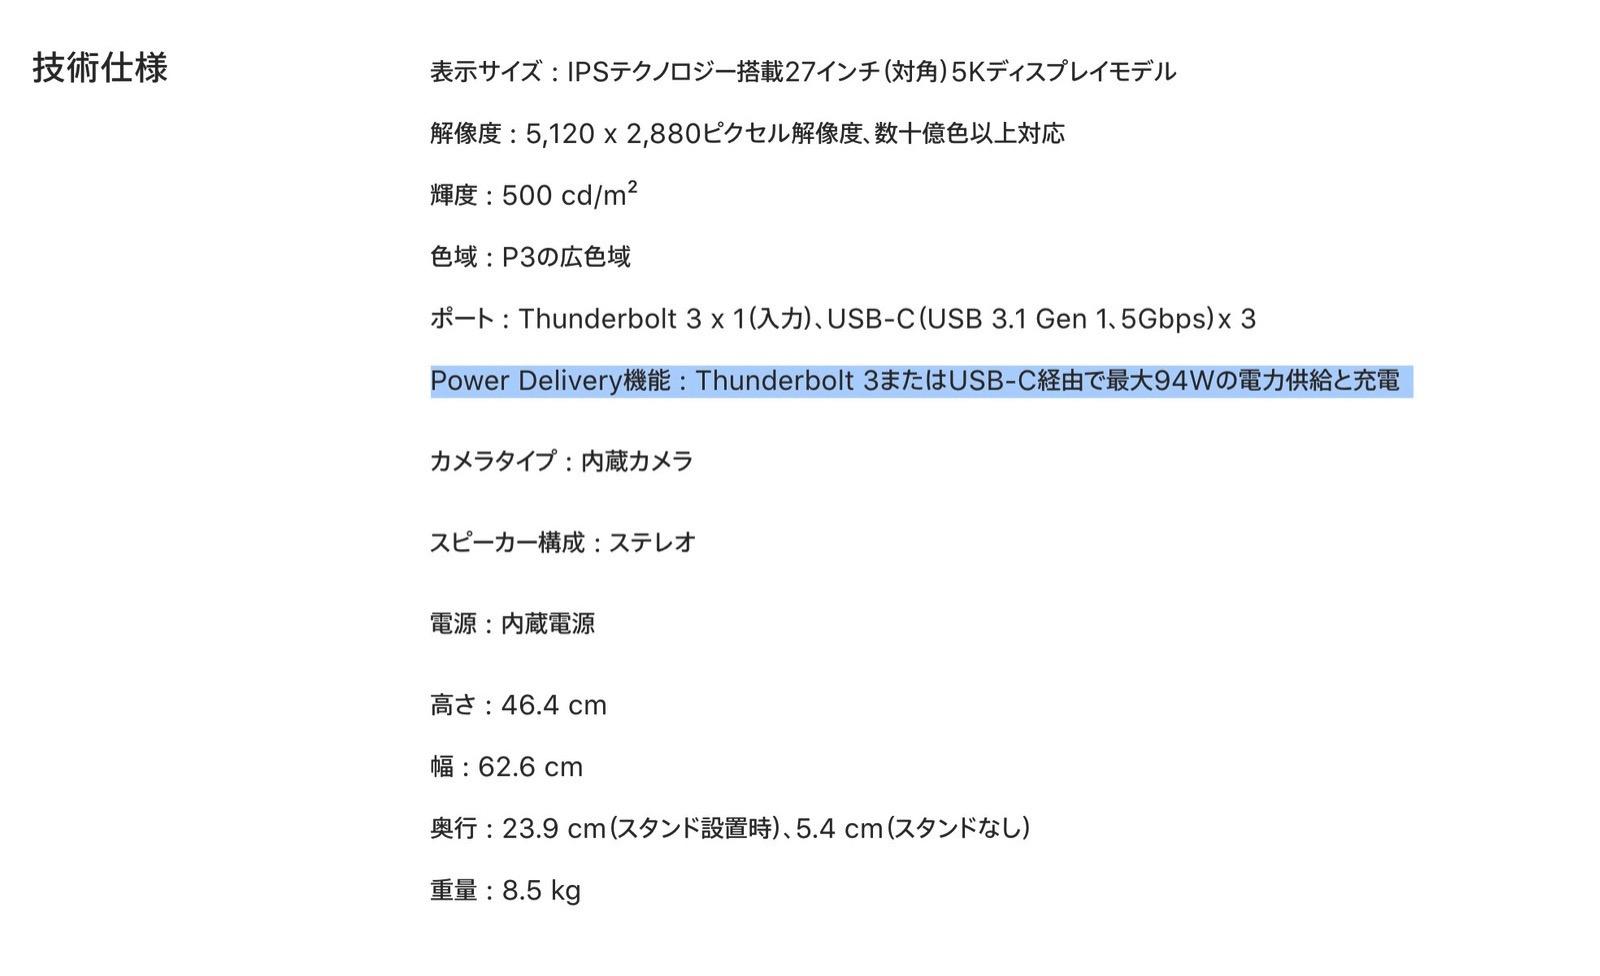 LG-UltraFine-5K-Display-2019-02.jpg